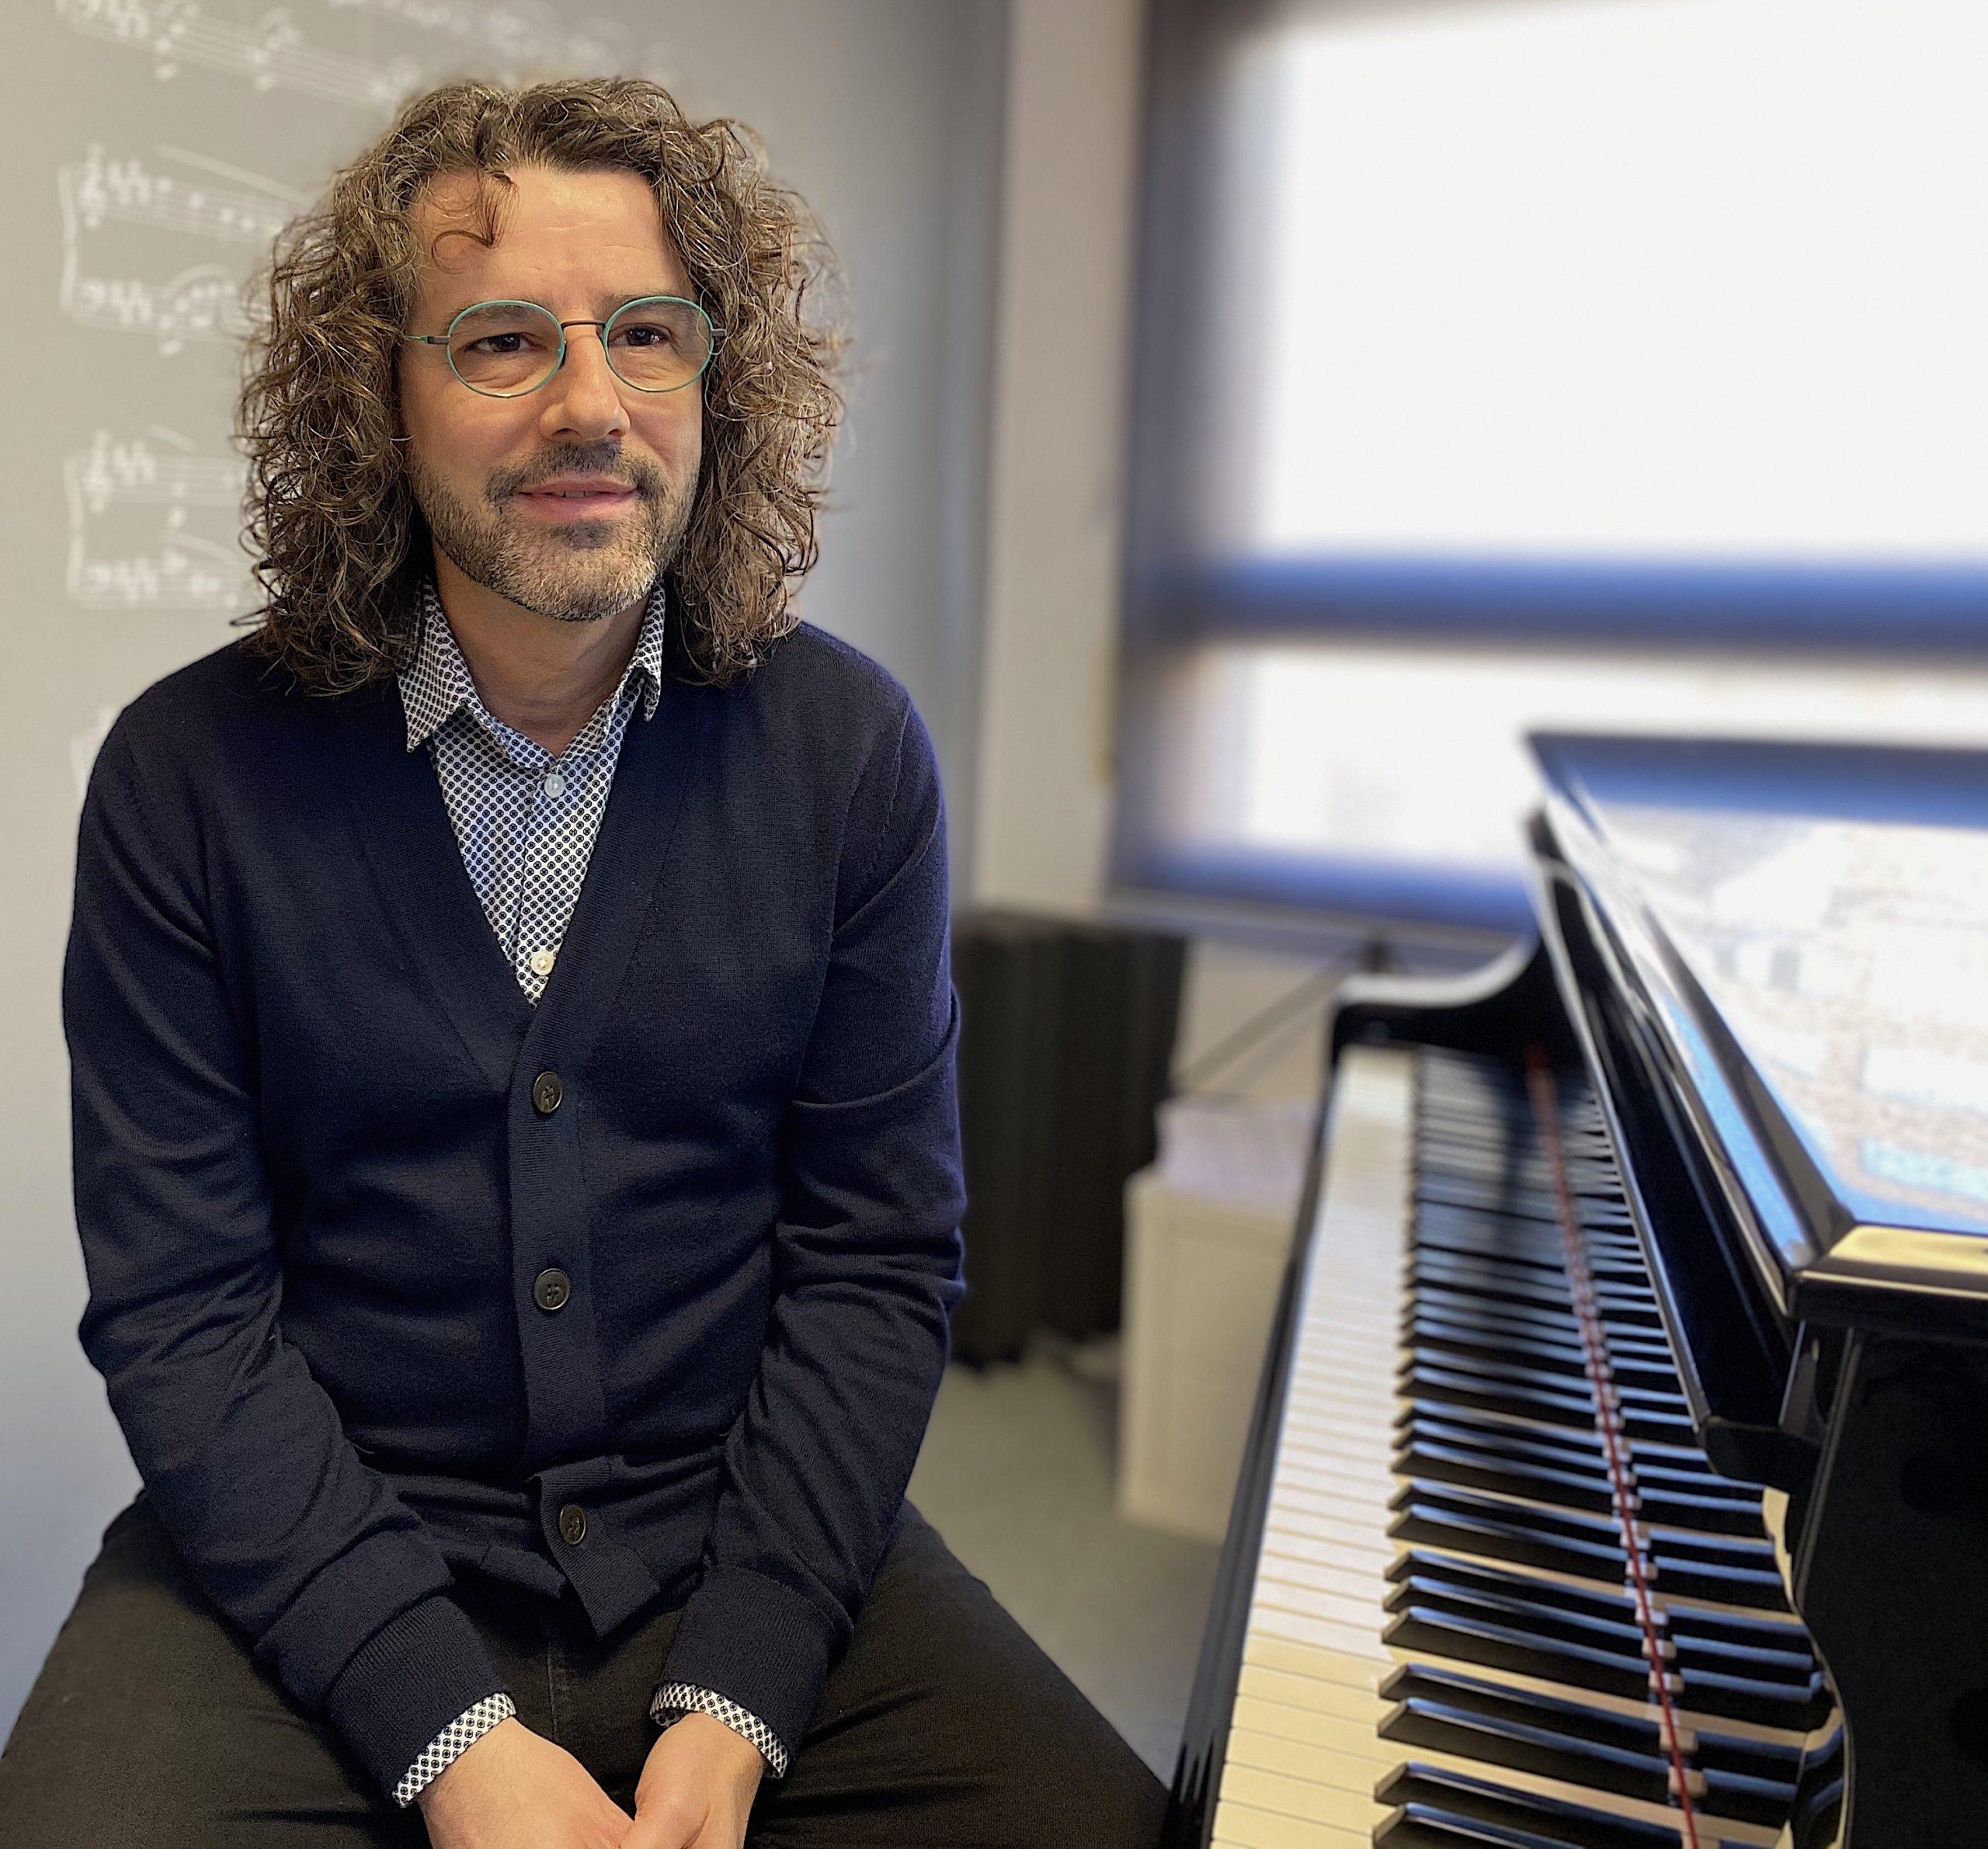 sobre Antoni Tolmos - pianista, compositor i conferenciant